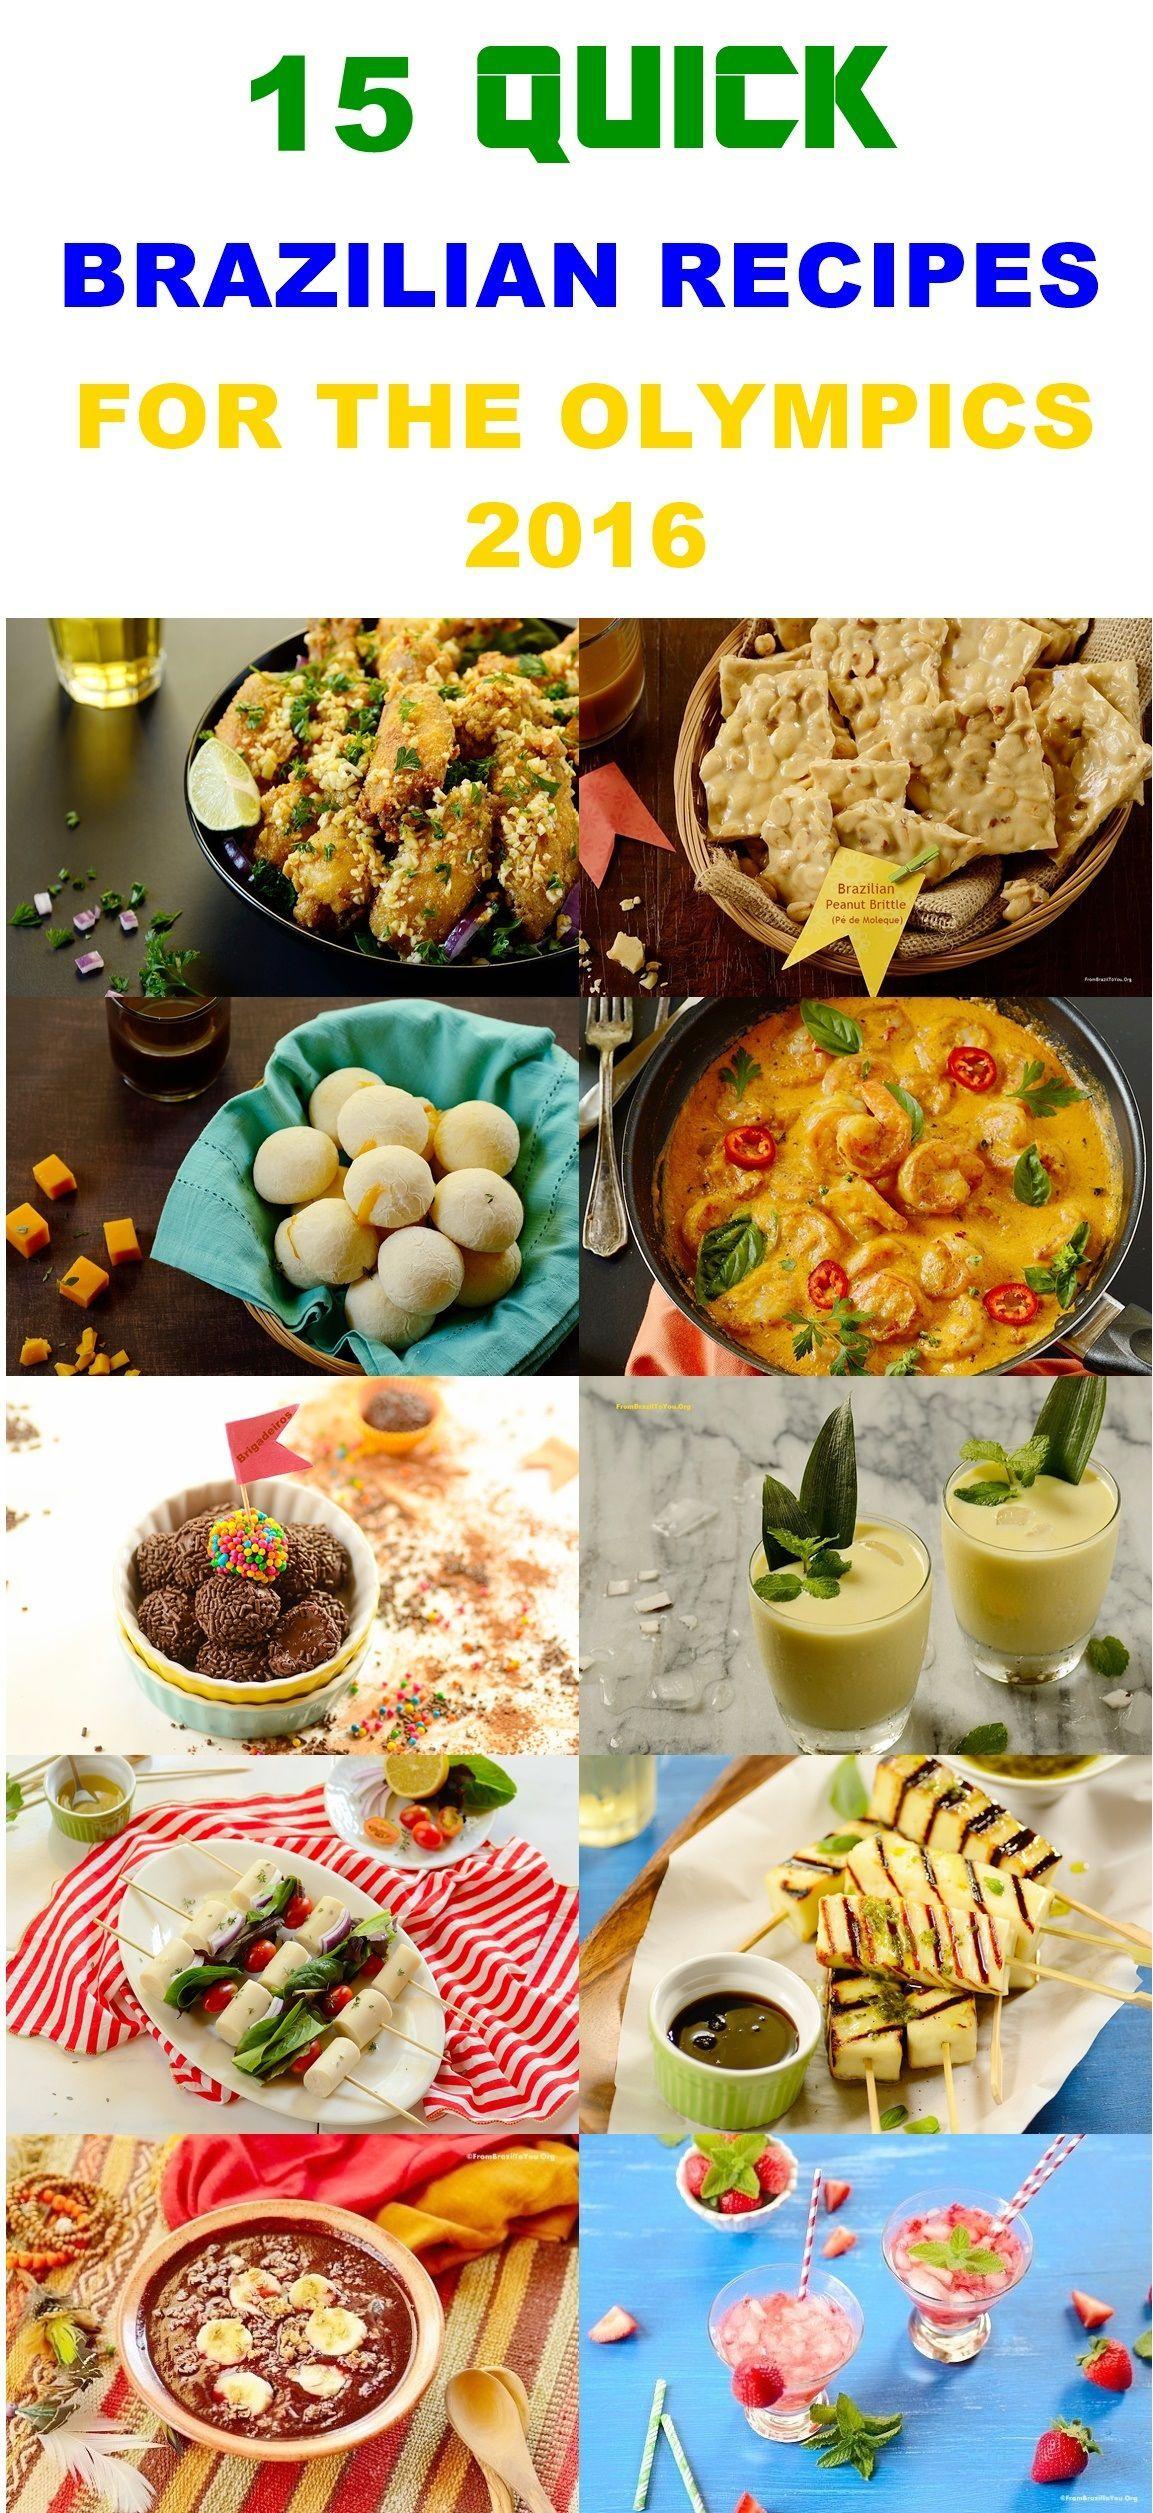 15 Quick Brazilian Recipes For The Olympics 2016